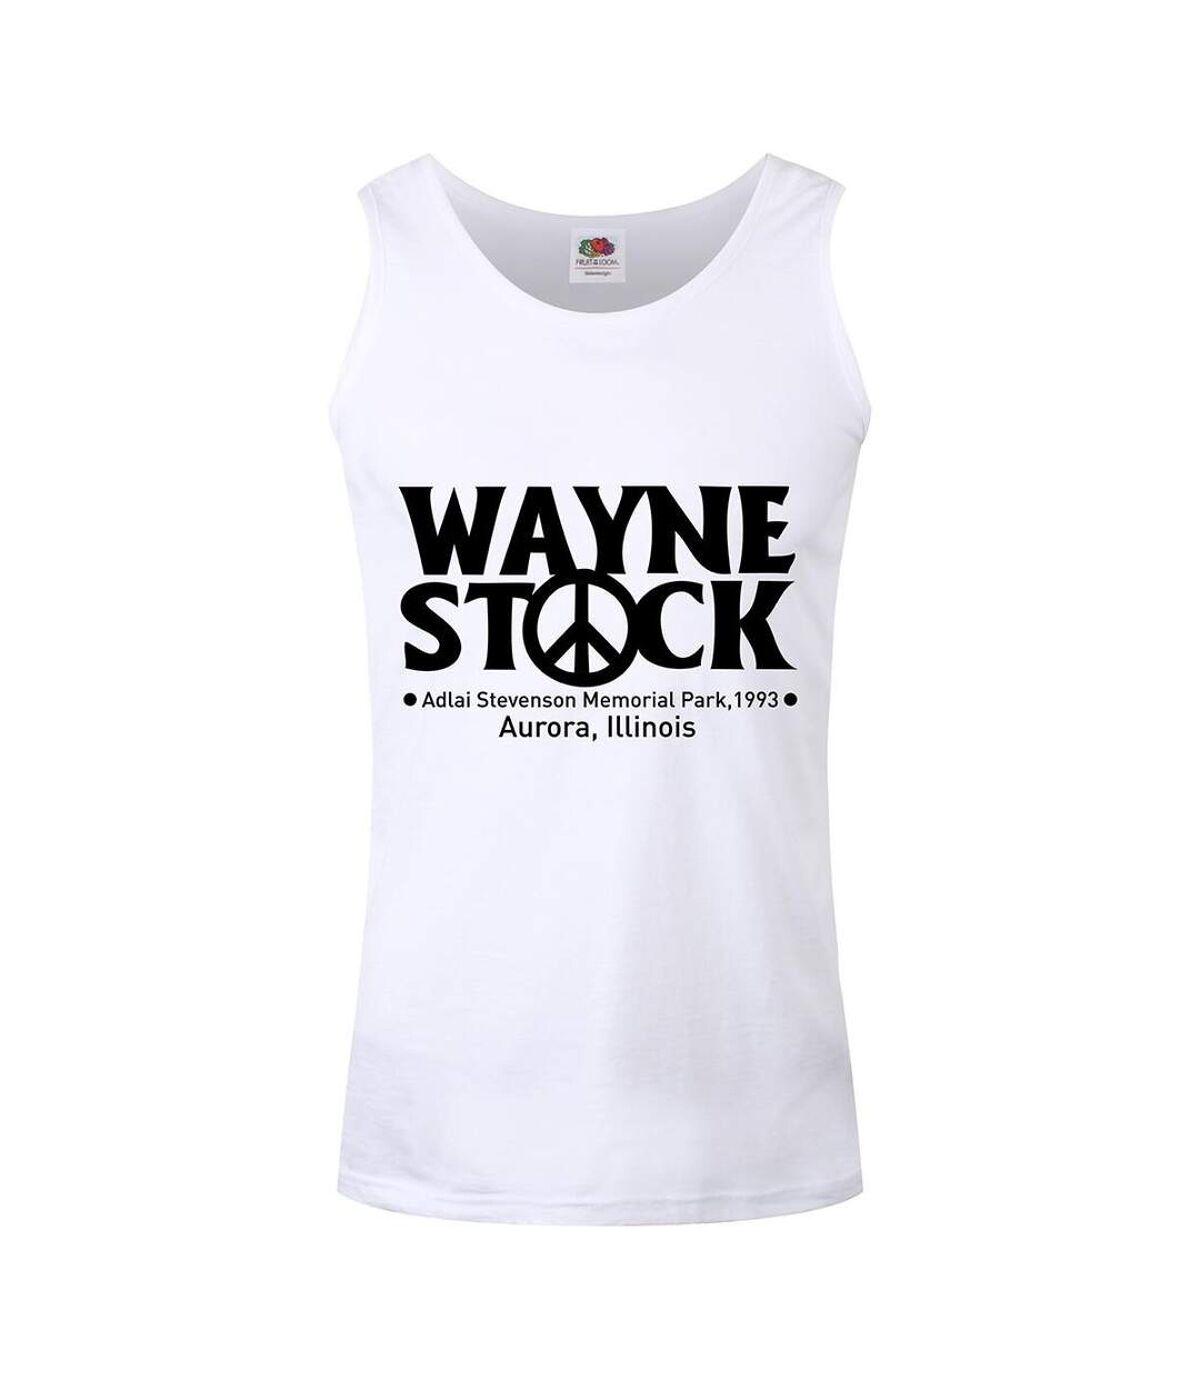 Grindstore Mens Wayne Stock Vest Top (White/Black) - UTGR4243